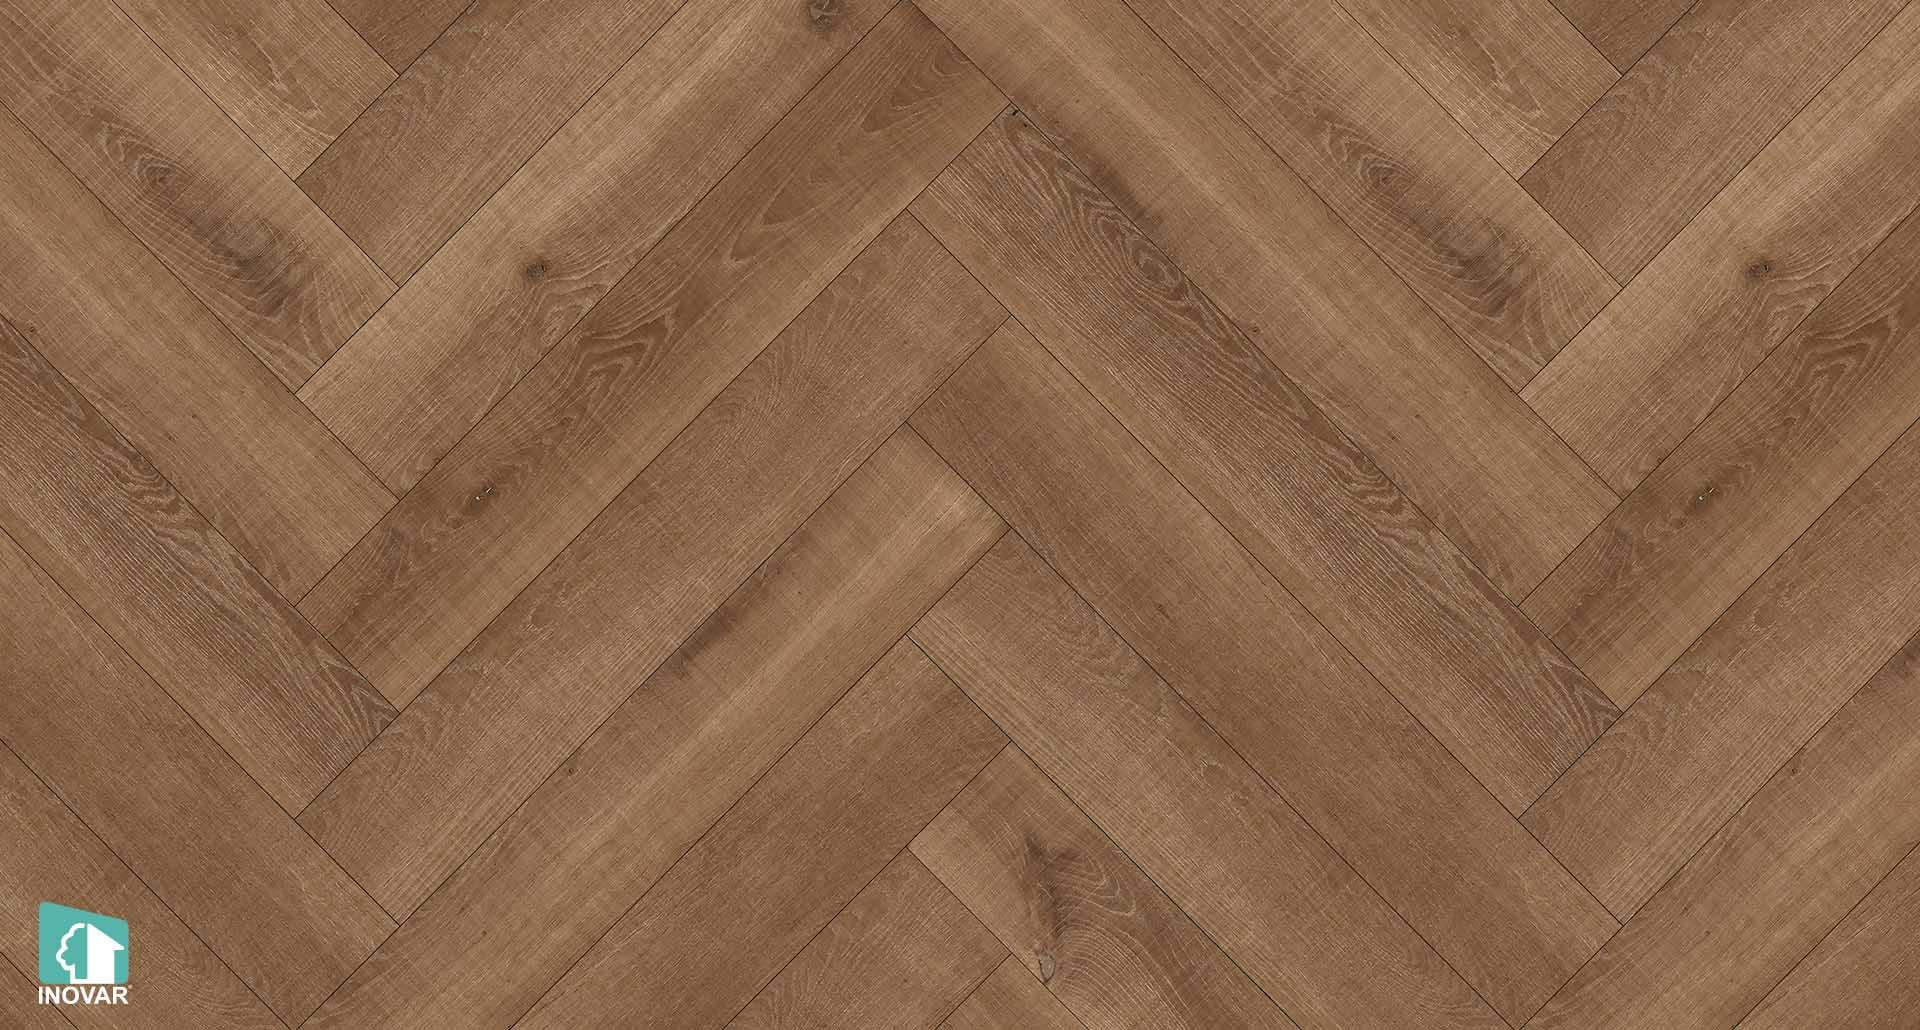 Sàn gỗ kỹ thuật Inovar